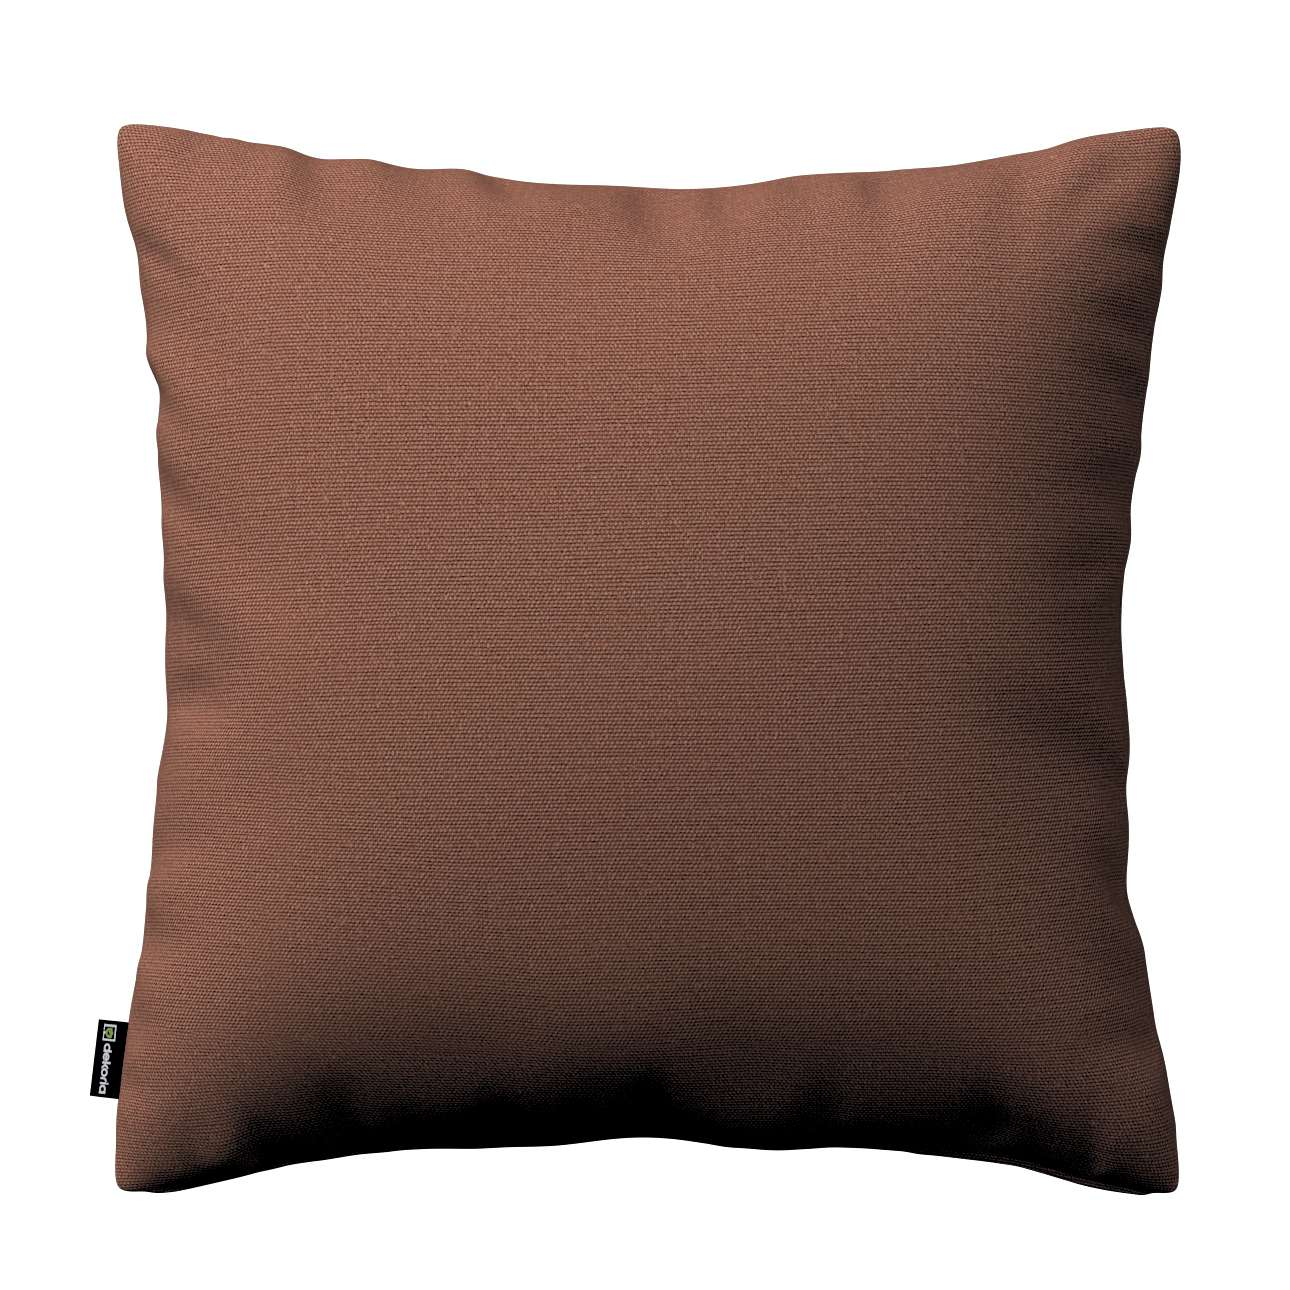 Kuddfodral standard i kollektionen Loneta, Tyg: 133-09